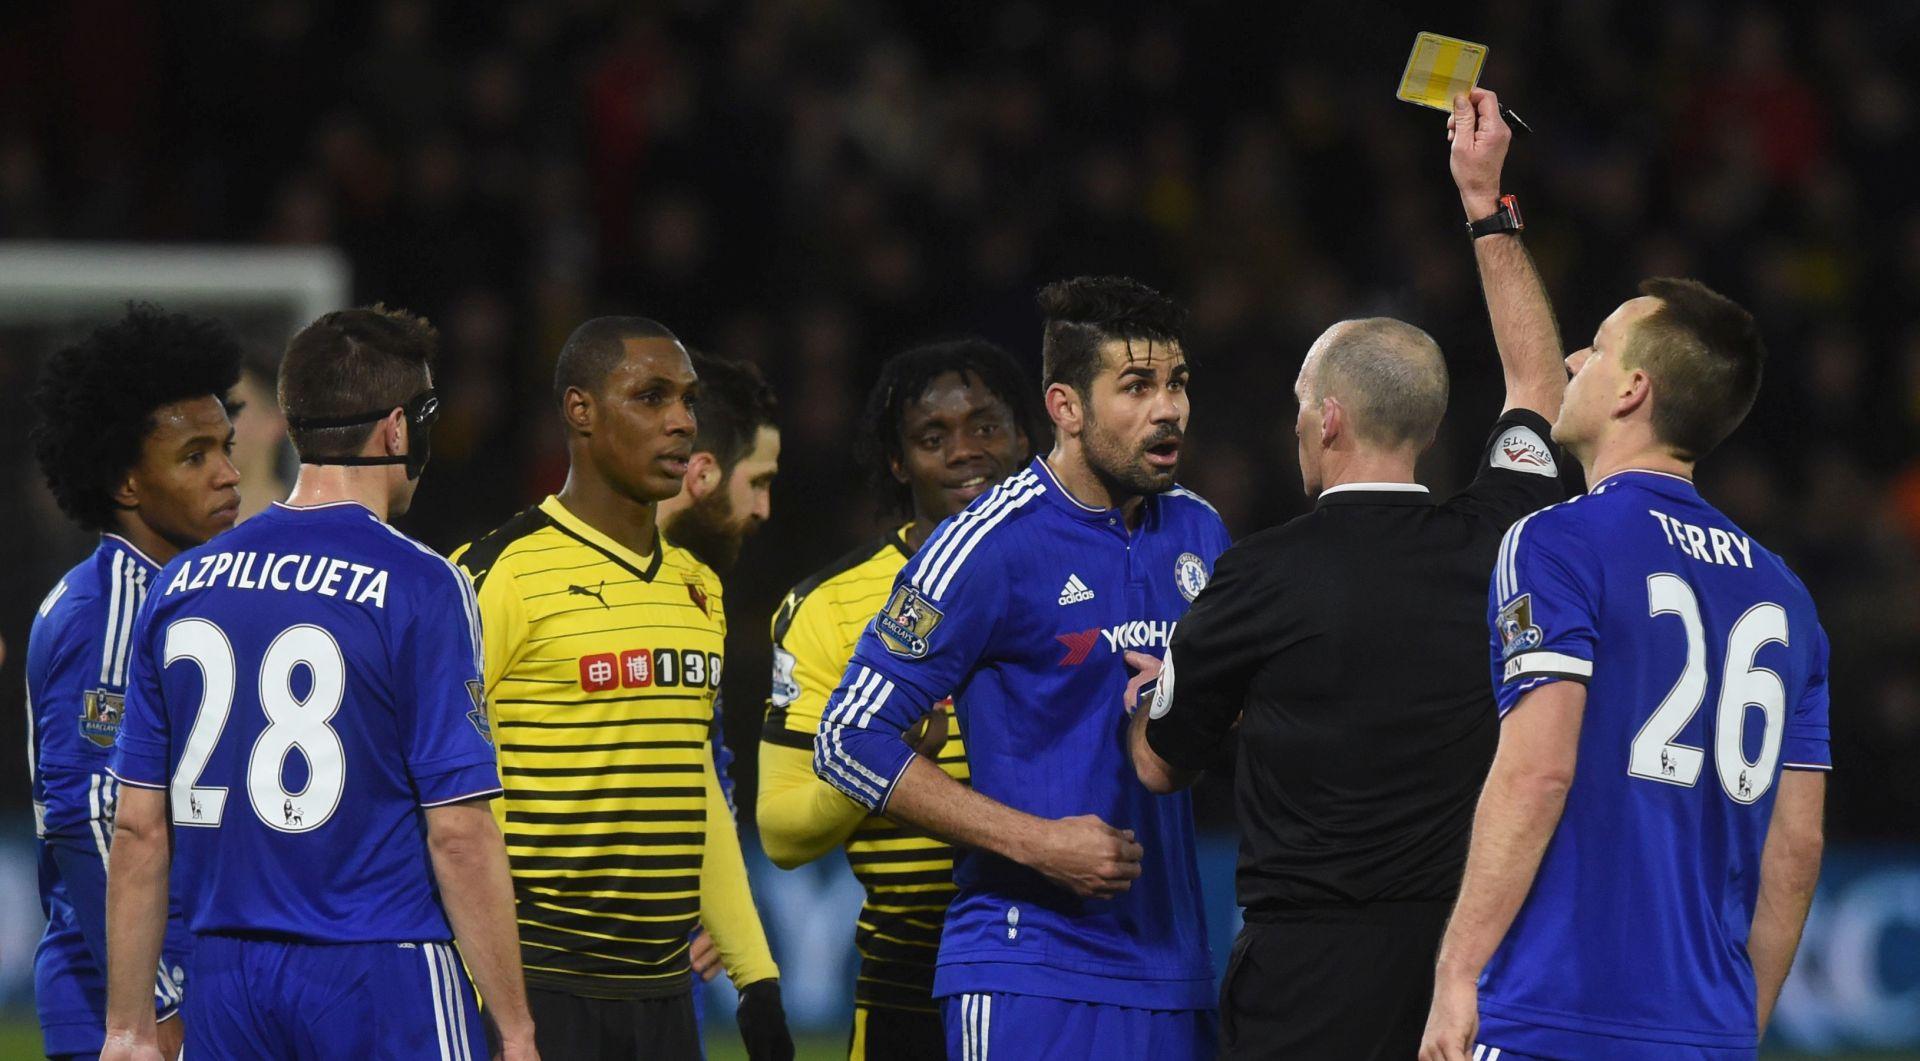 ZAVRŠENO 24. KOLO PREMIERLIGE Everton slavio protiv Newcastlea, Watford i Chelsea bez golova